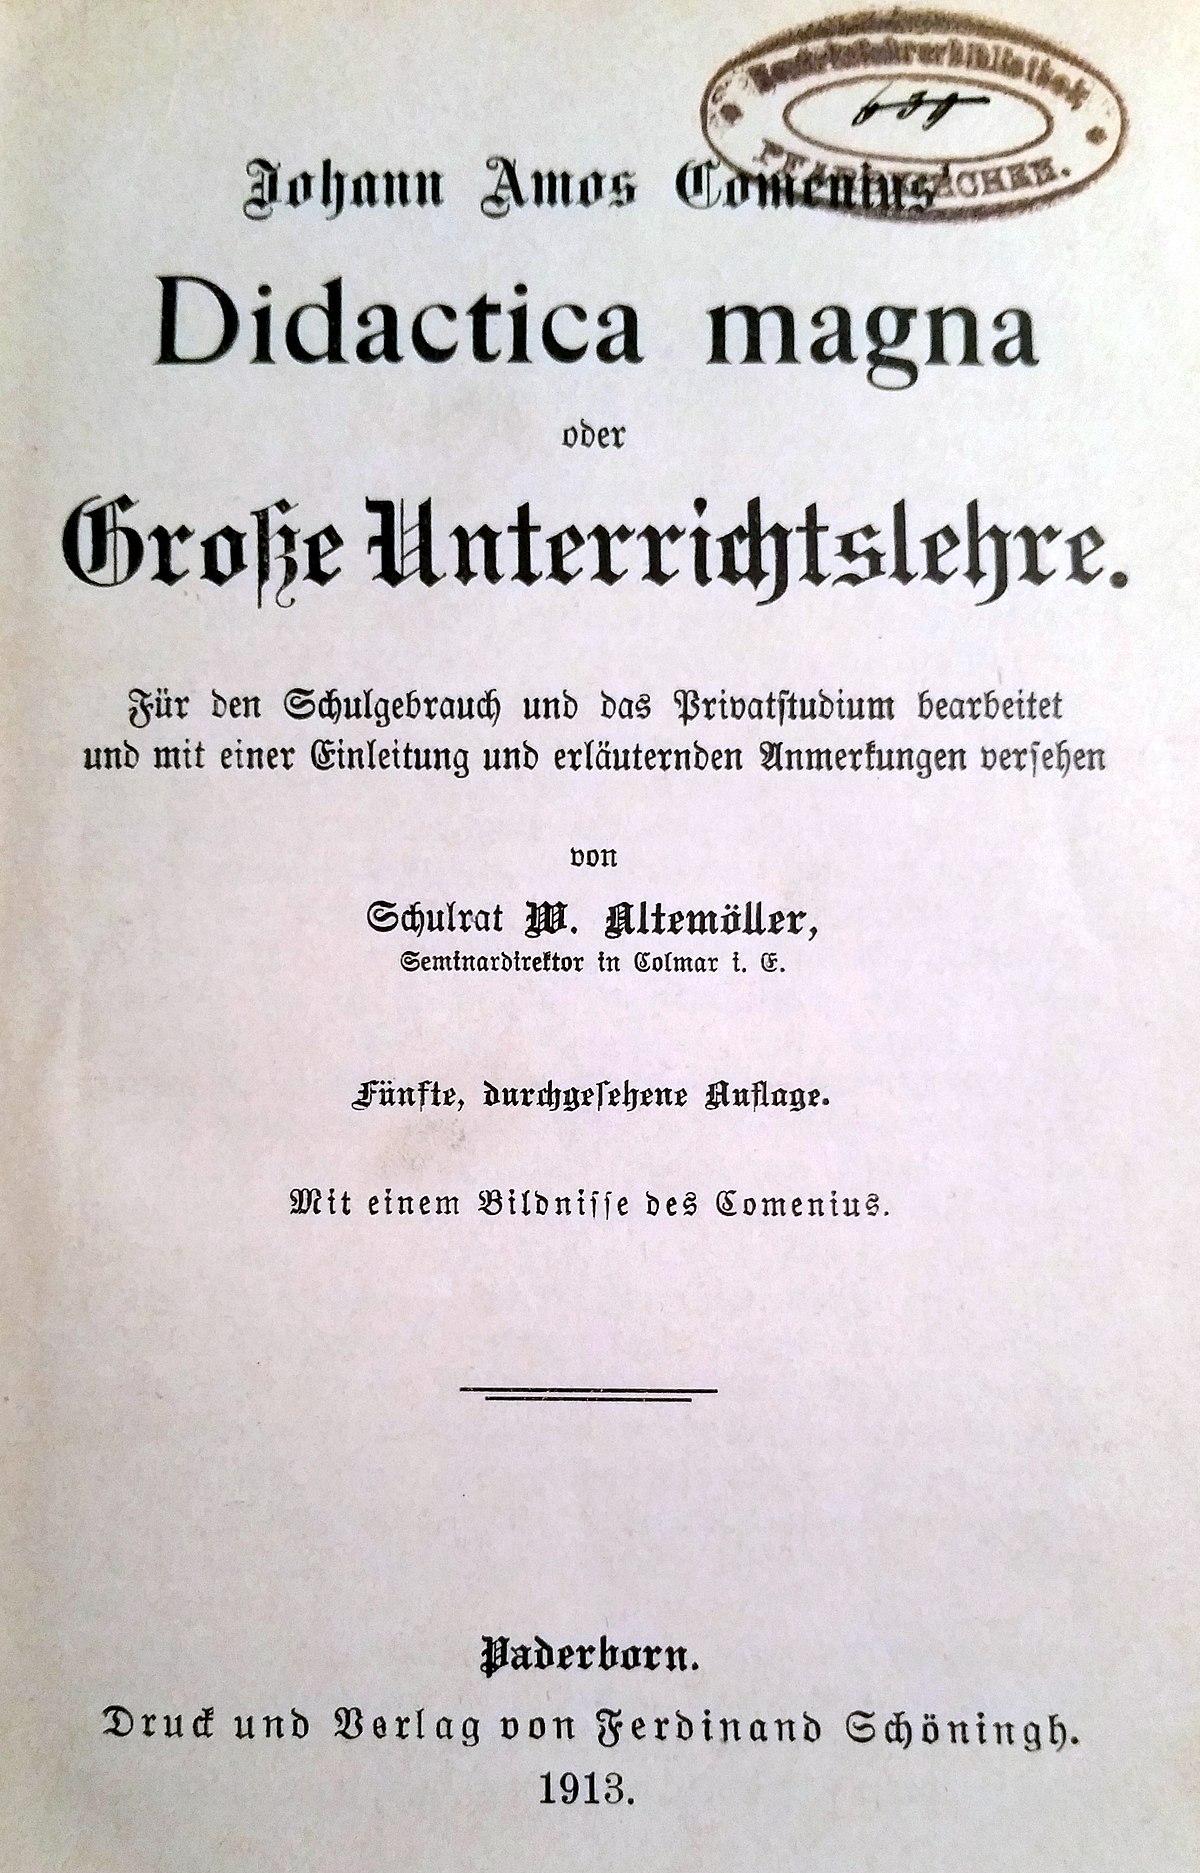 Johann Amos Comenius Didactica Magna Didactic